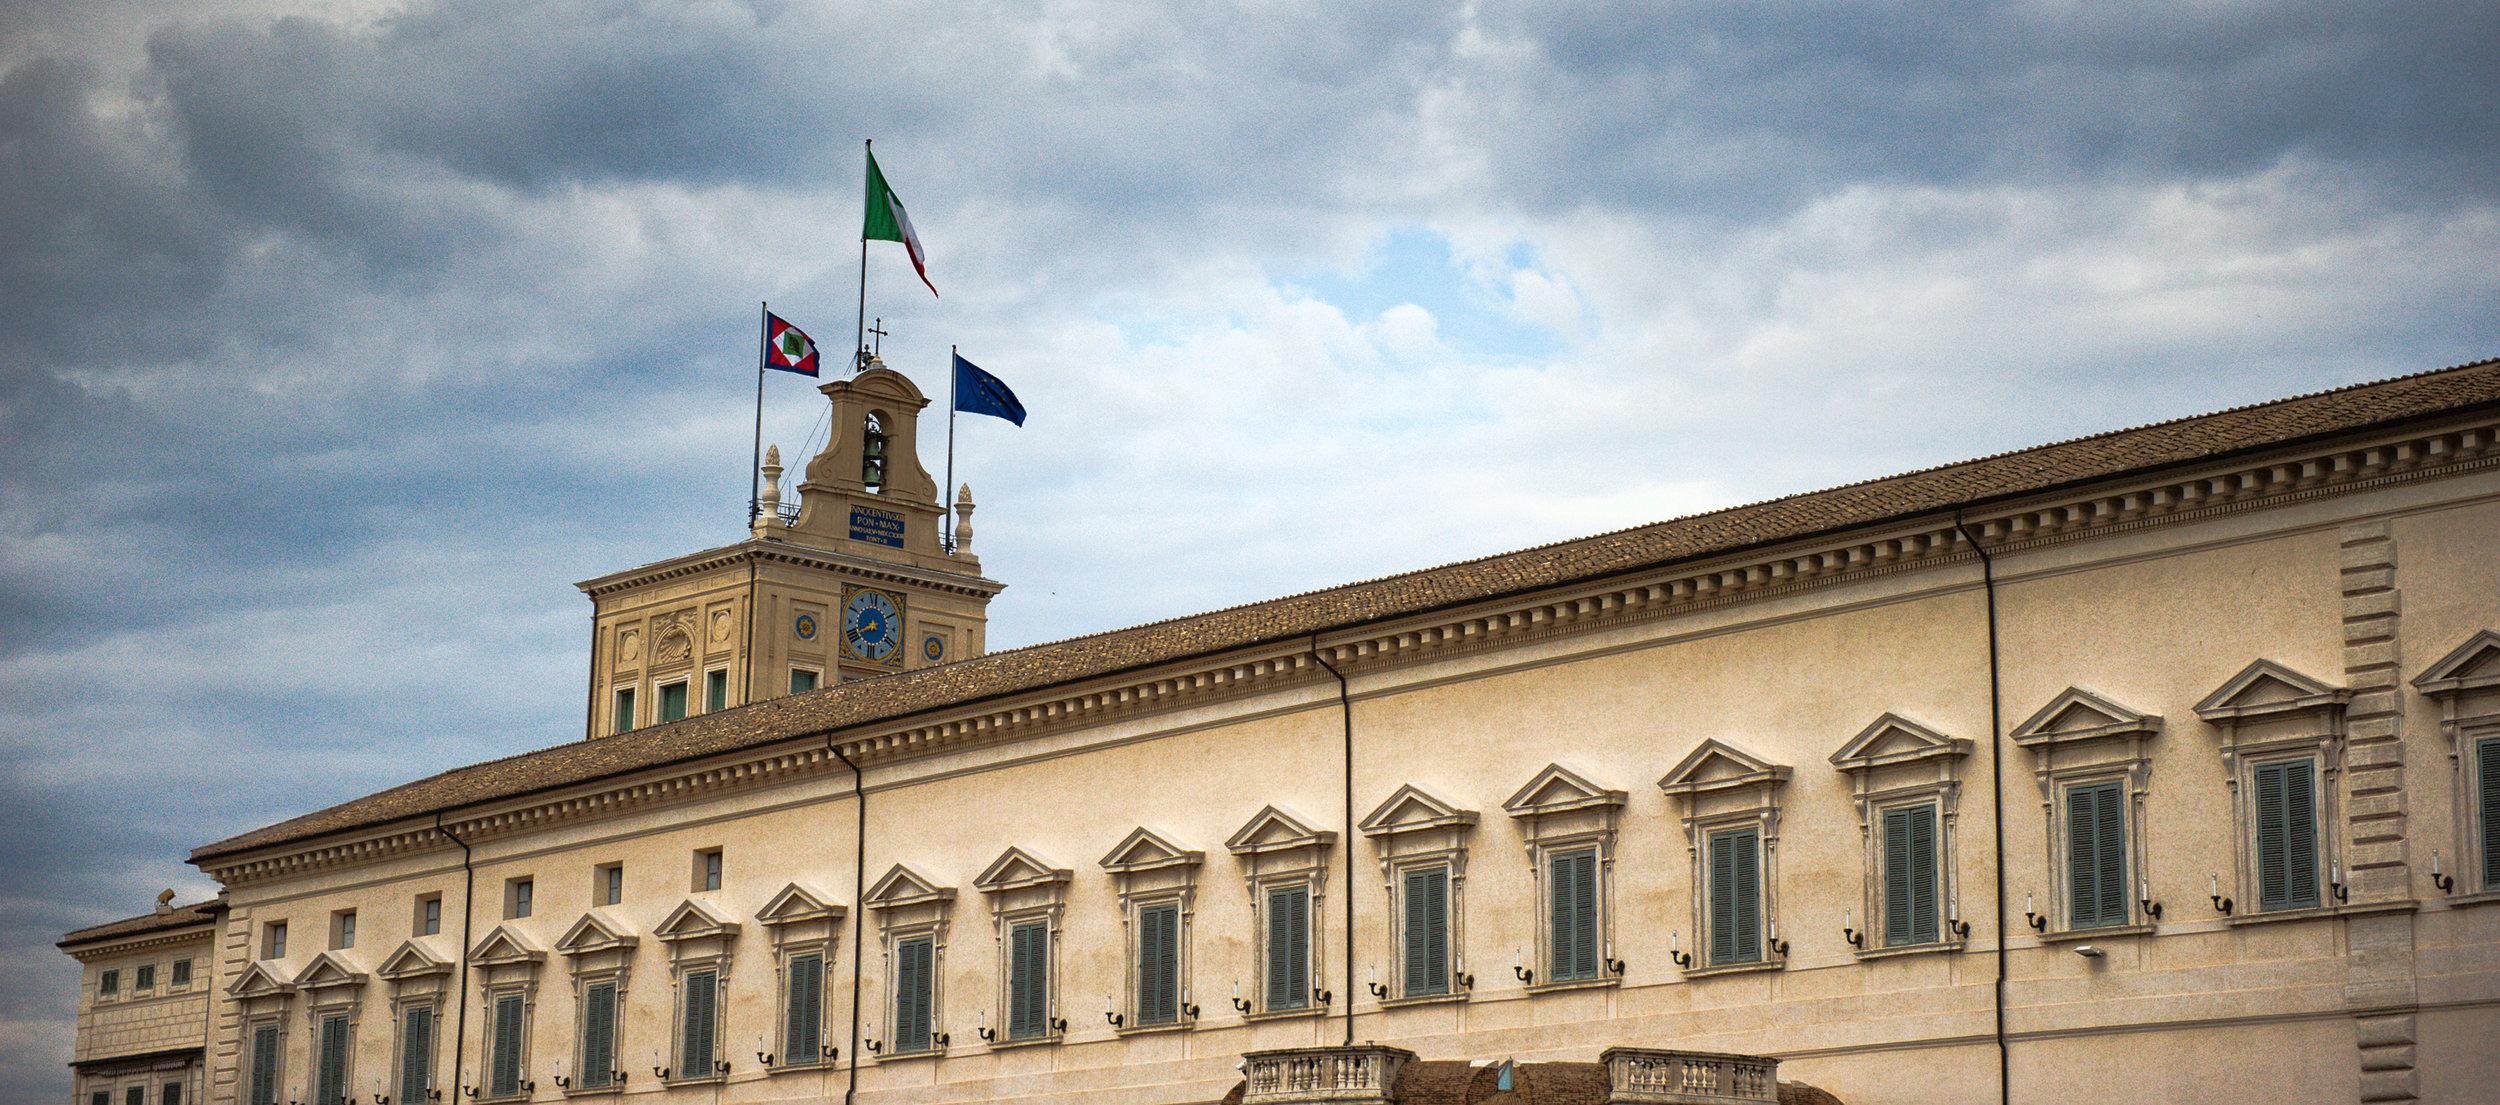 Italy-John Bardell-0534a.jpg